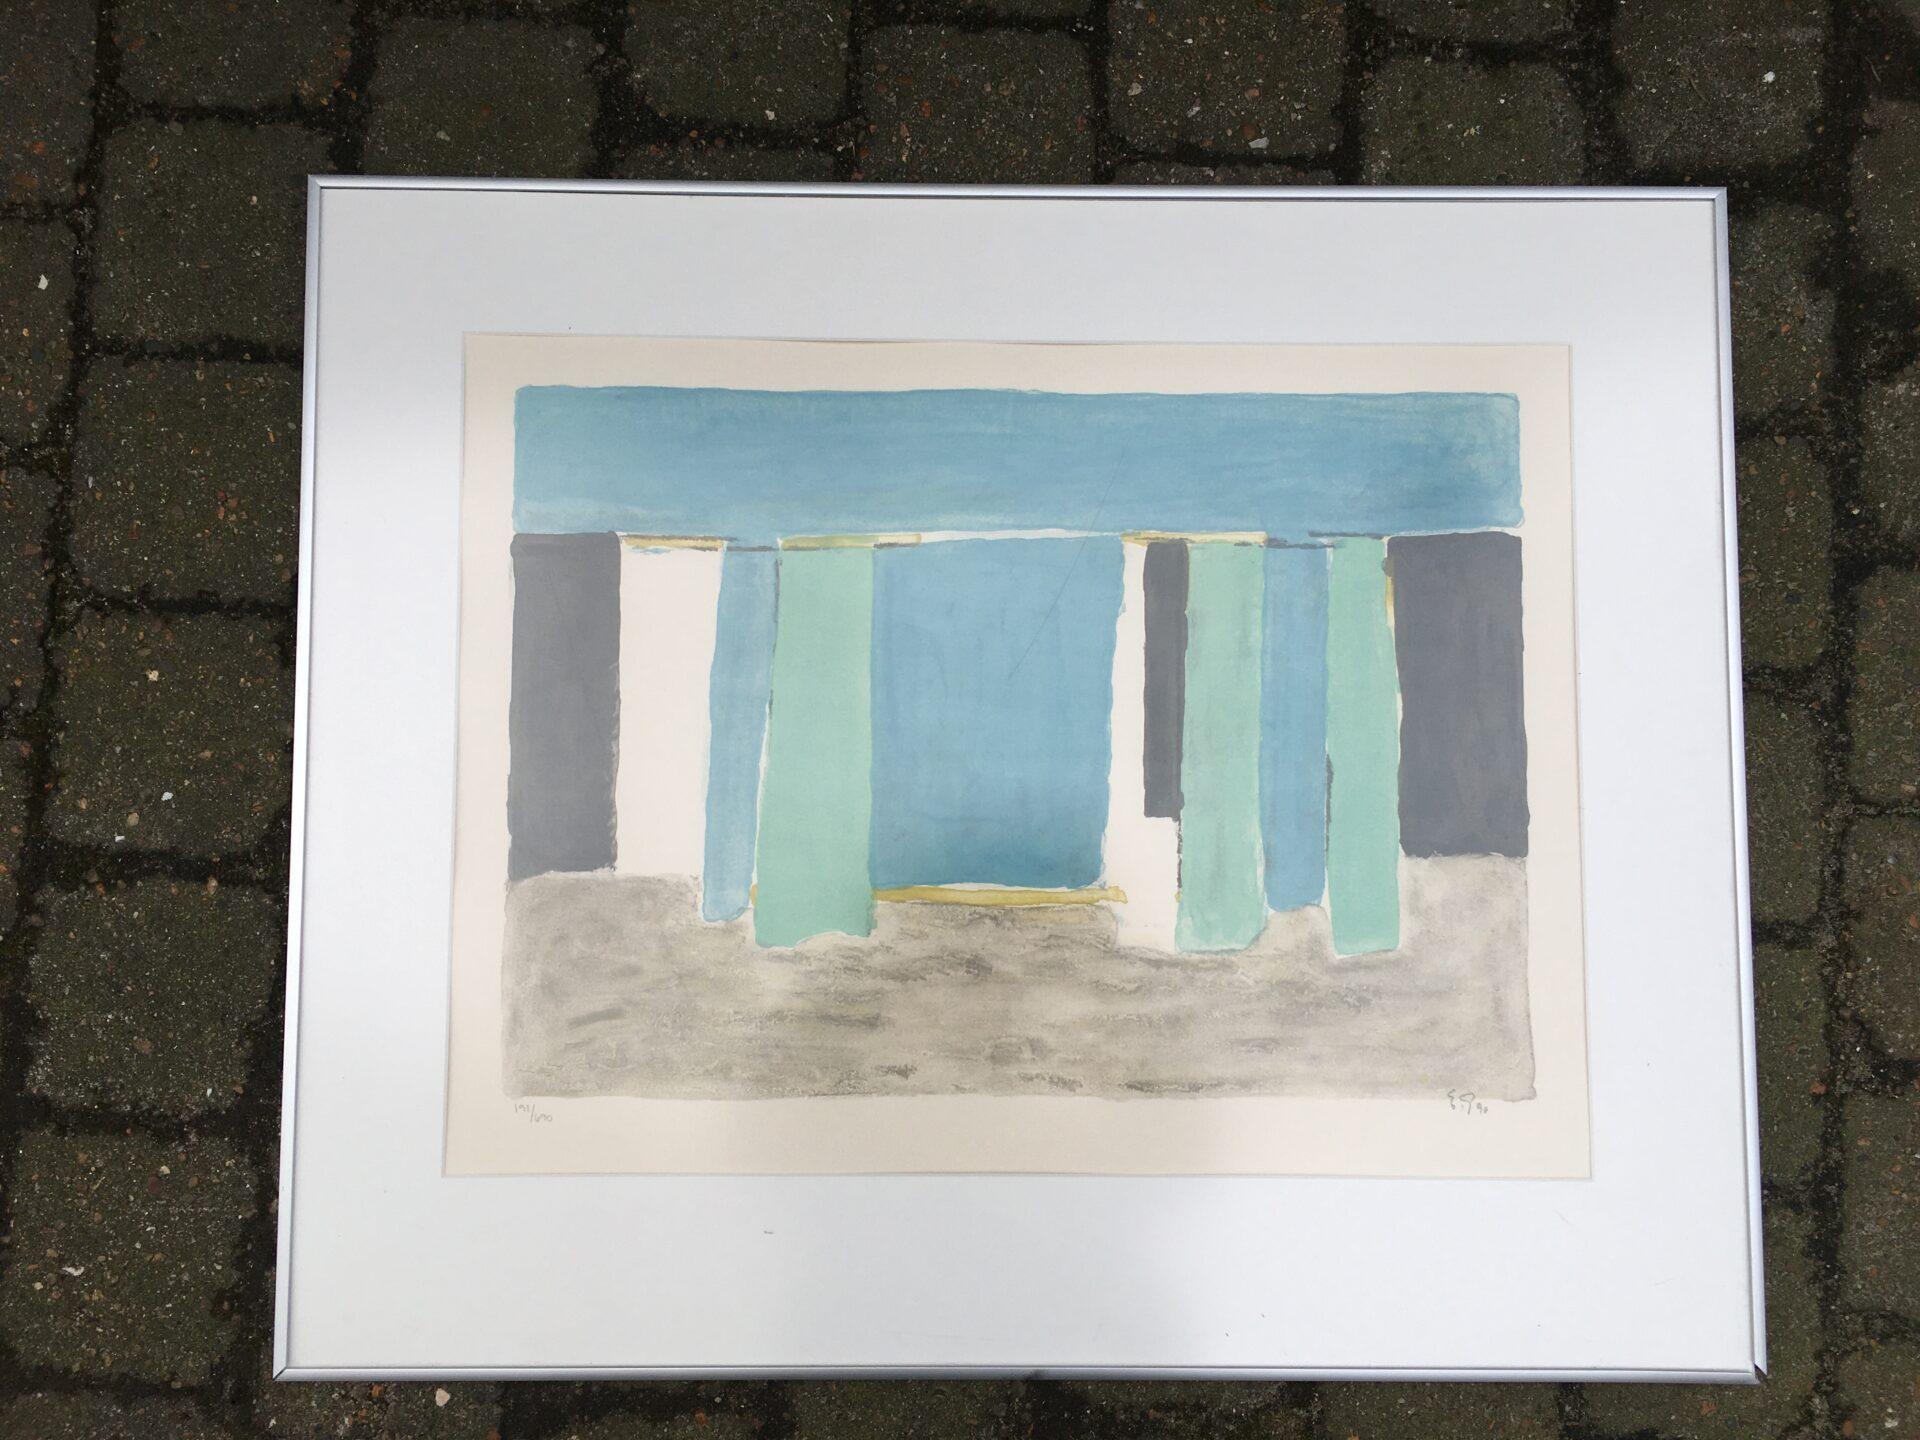 Emil Gregersen, litografi nr191/690, signeret i 90, rammemål 64x77. Pris 400kr